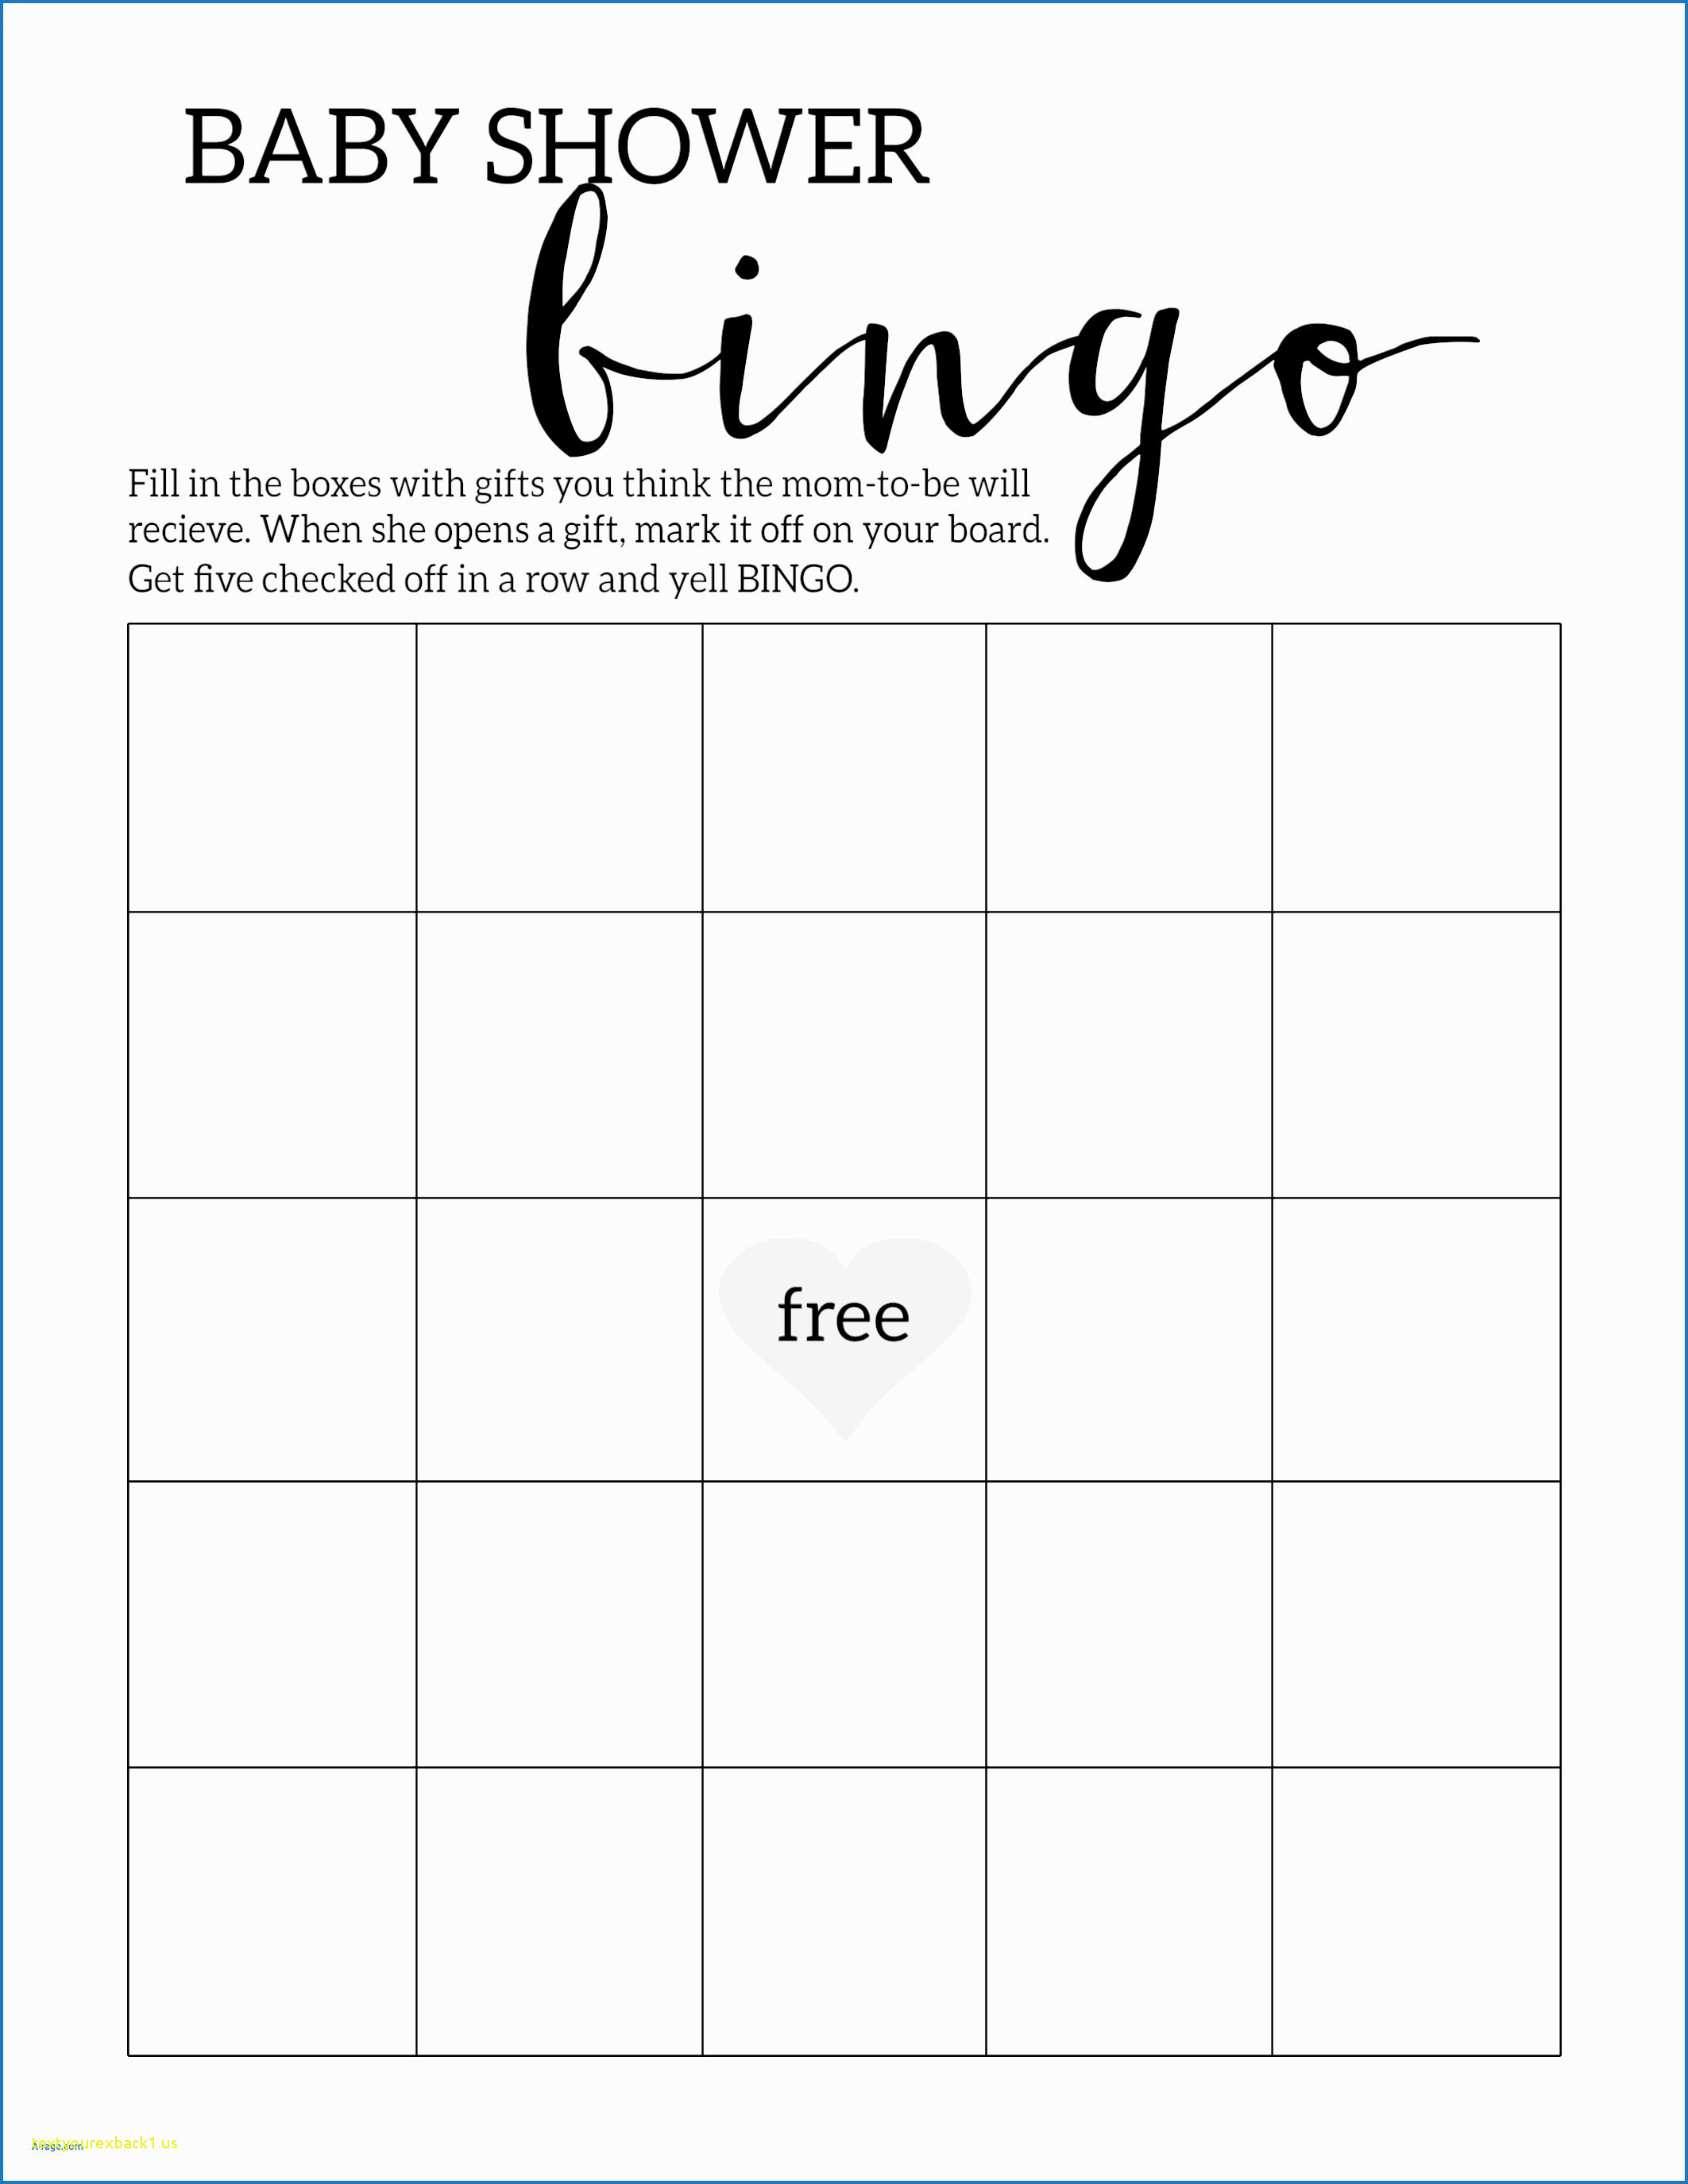 Bingo Spreadsheet Template Inside Bingo Template Excel